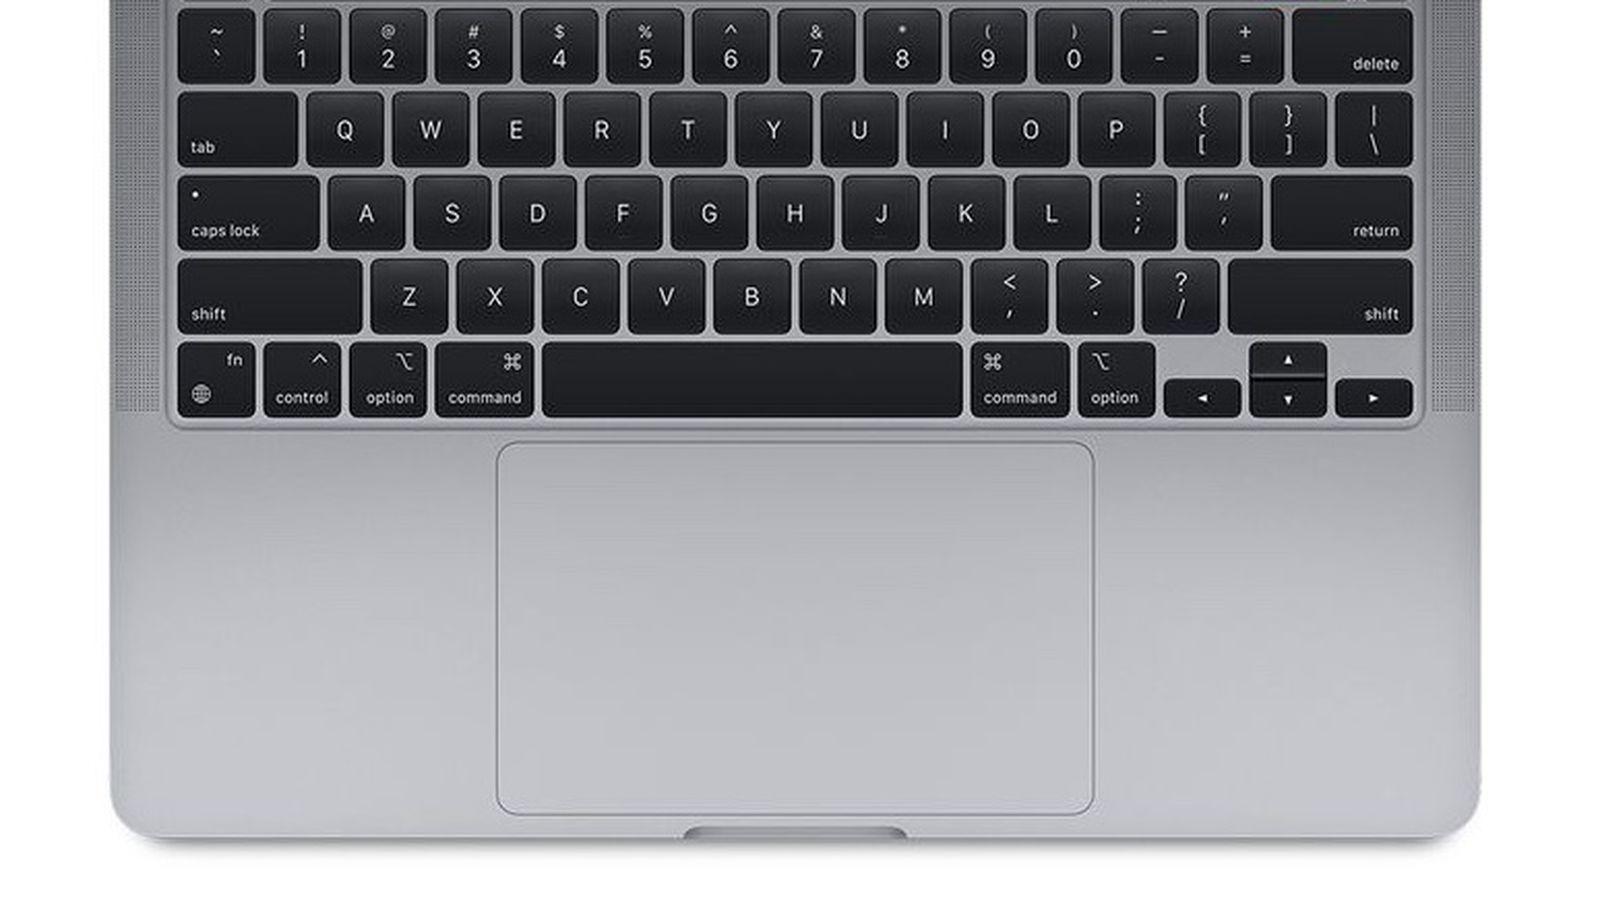 macbook trackpad.